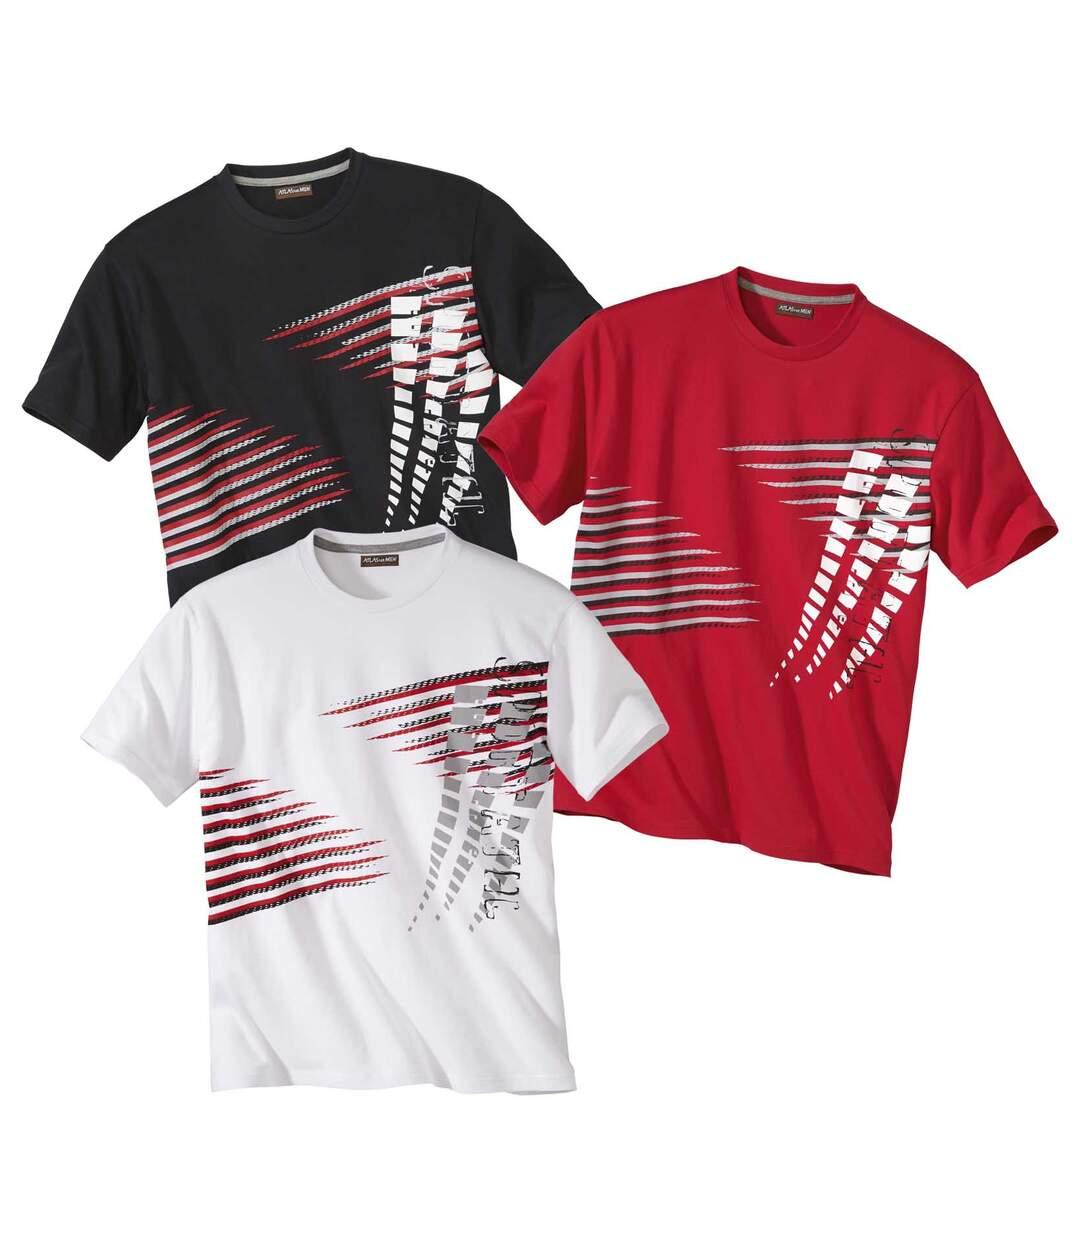 Súprava 3 tričiek Graphic